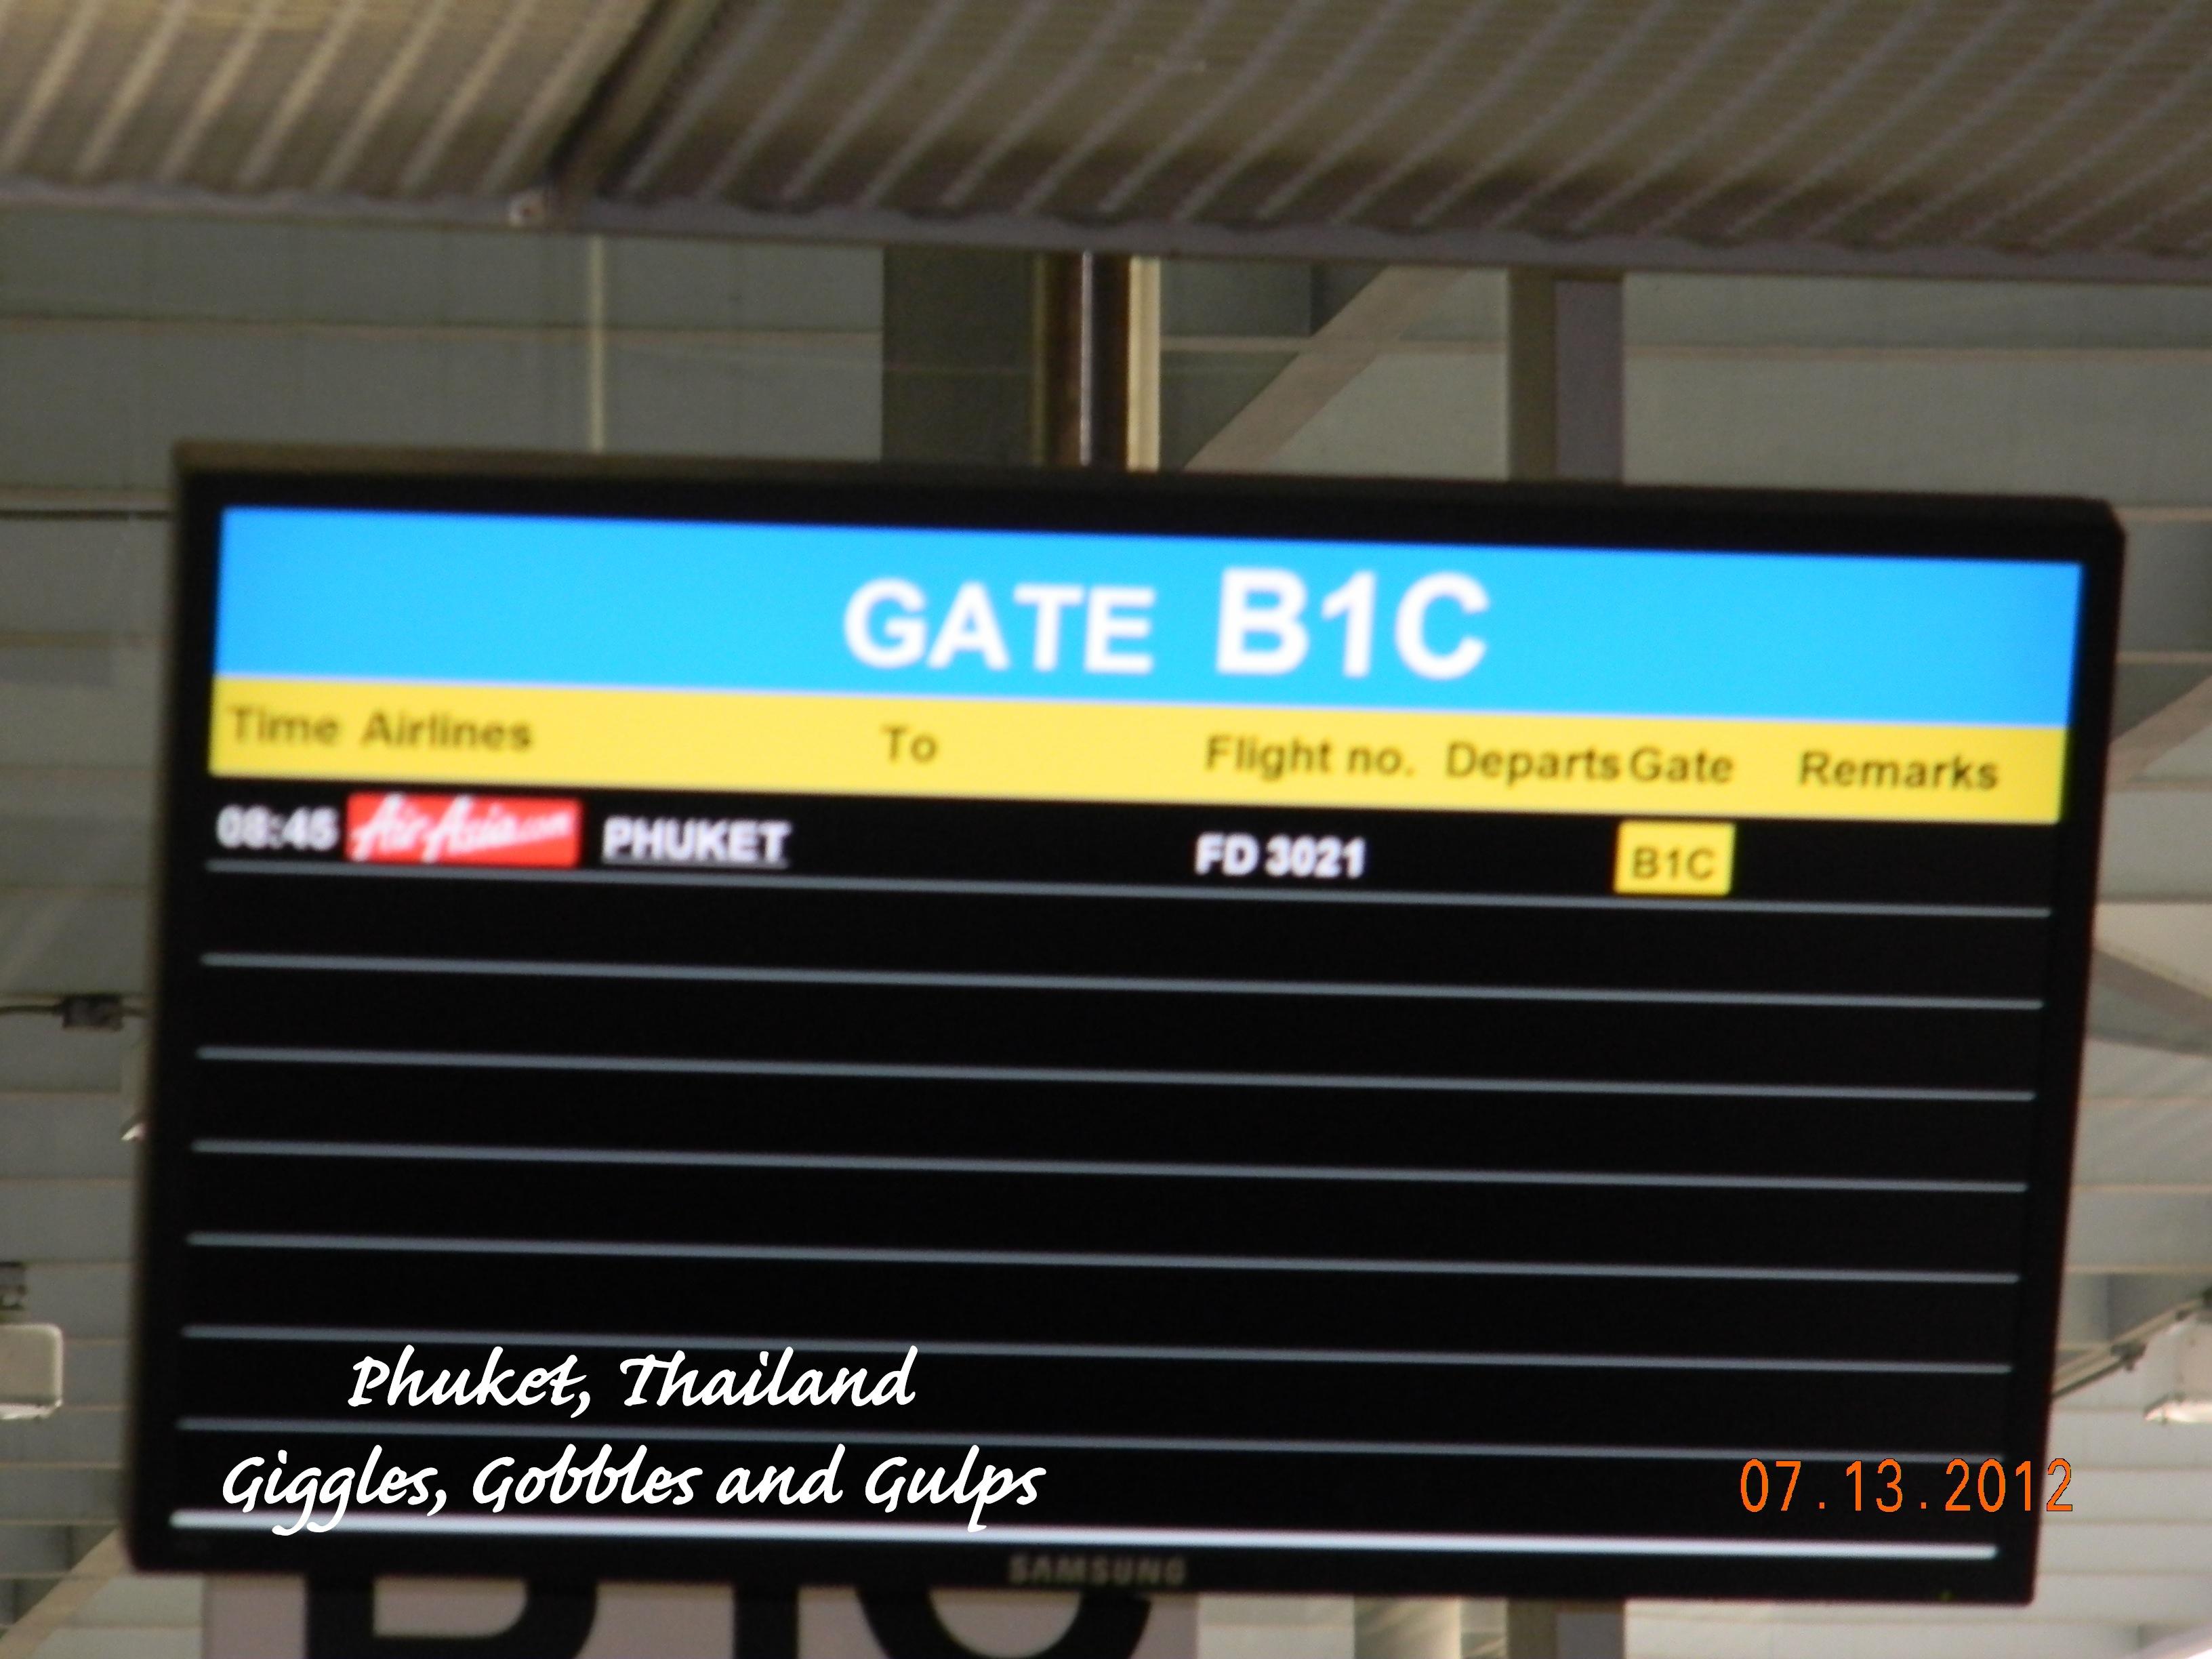 Air Asia flight to Phuket, Thailand